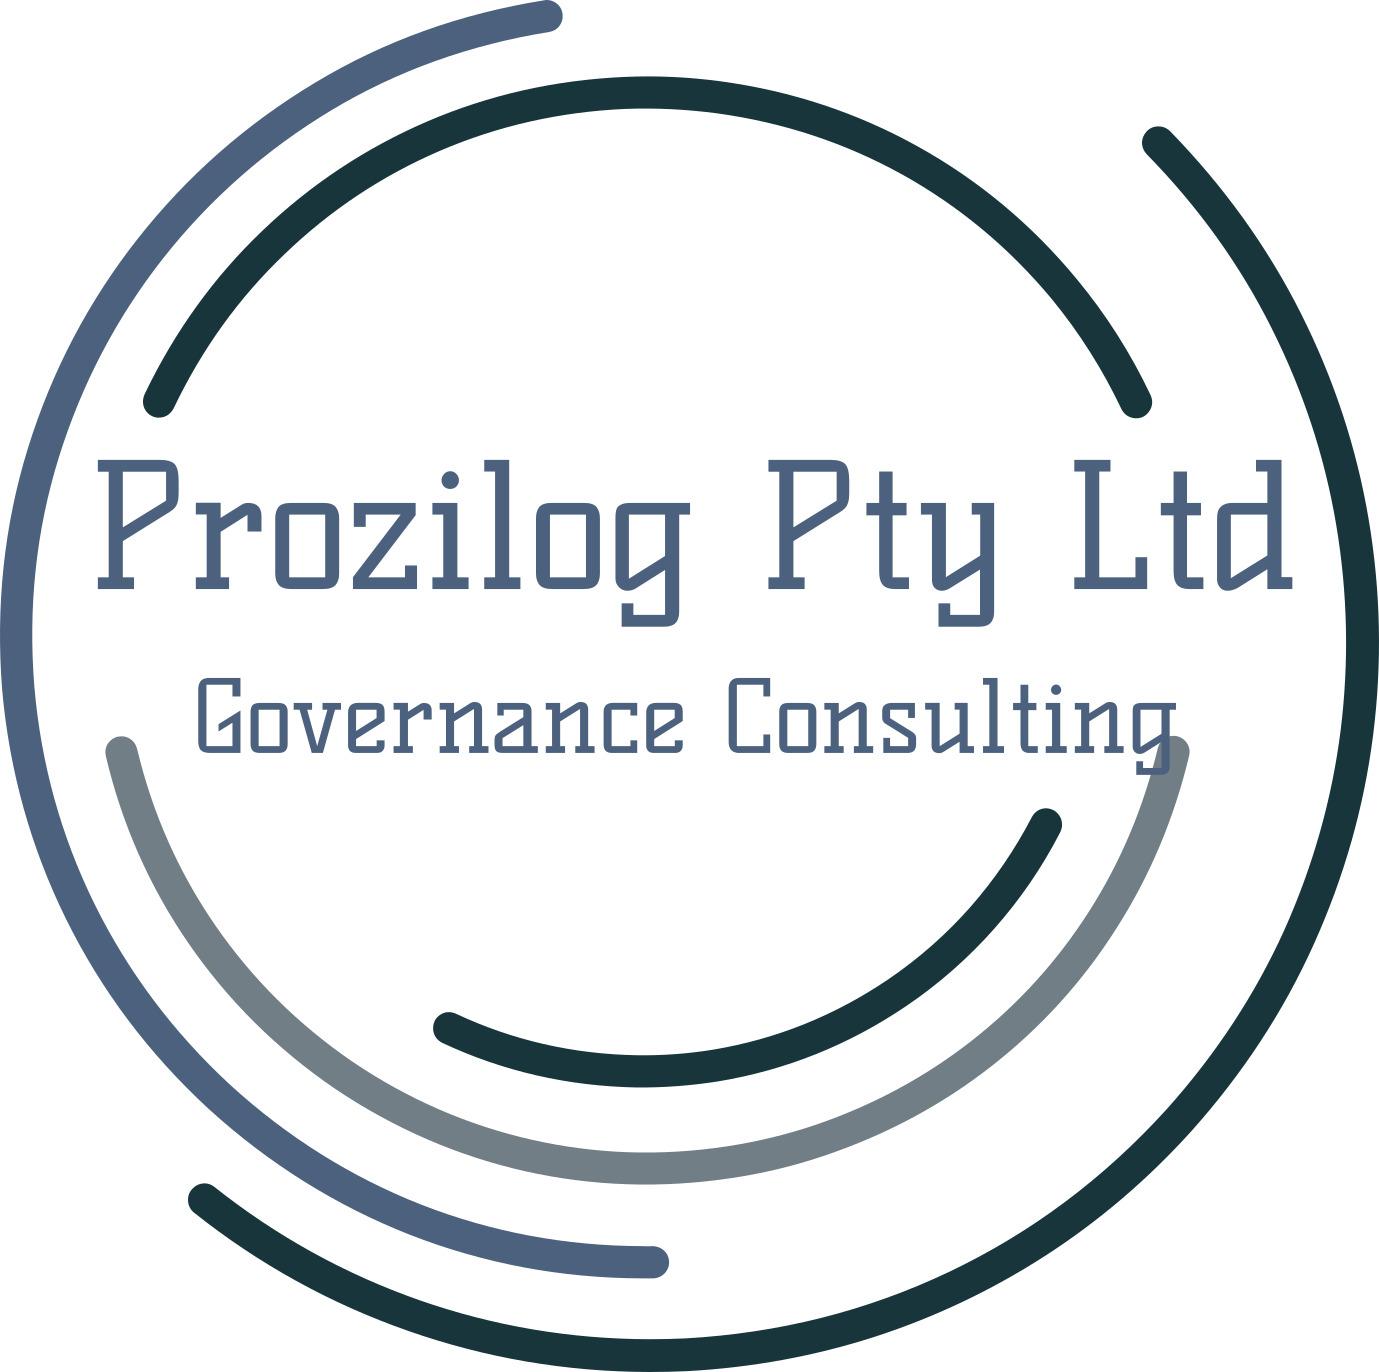 Business Listing for Prozilog Pty Ltd